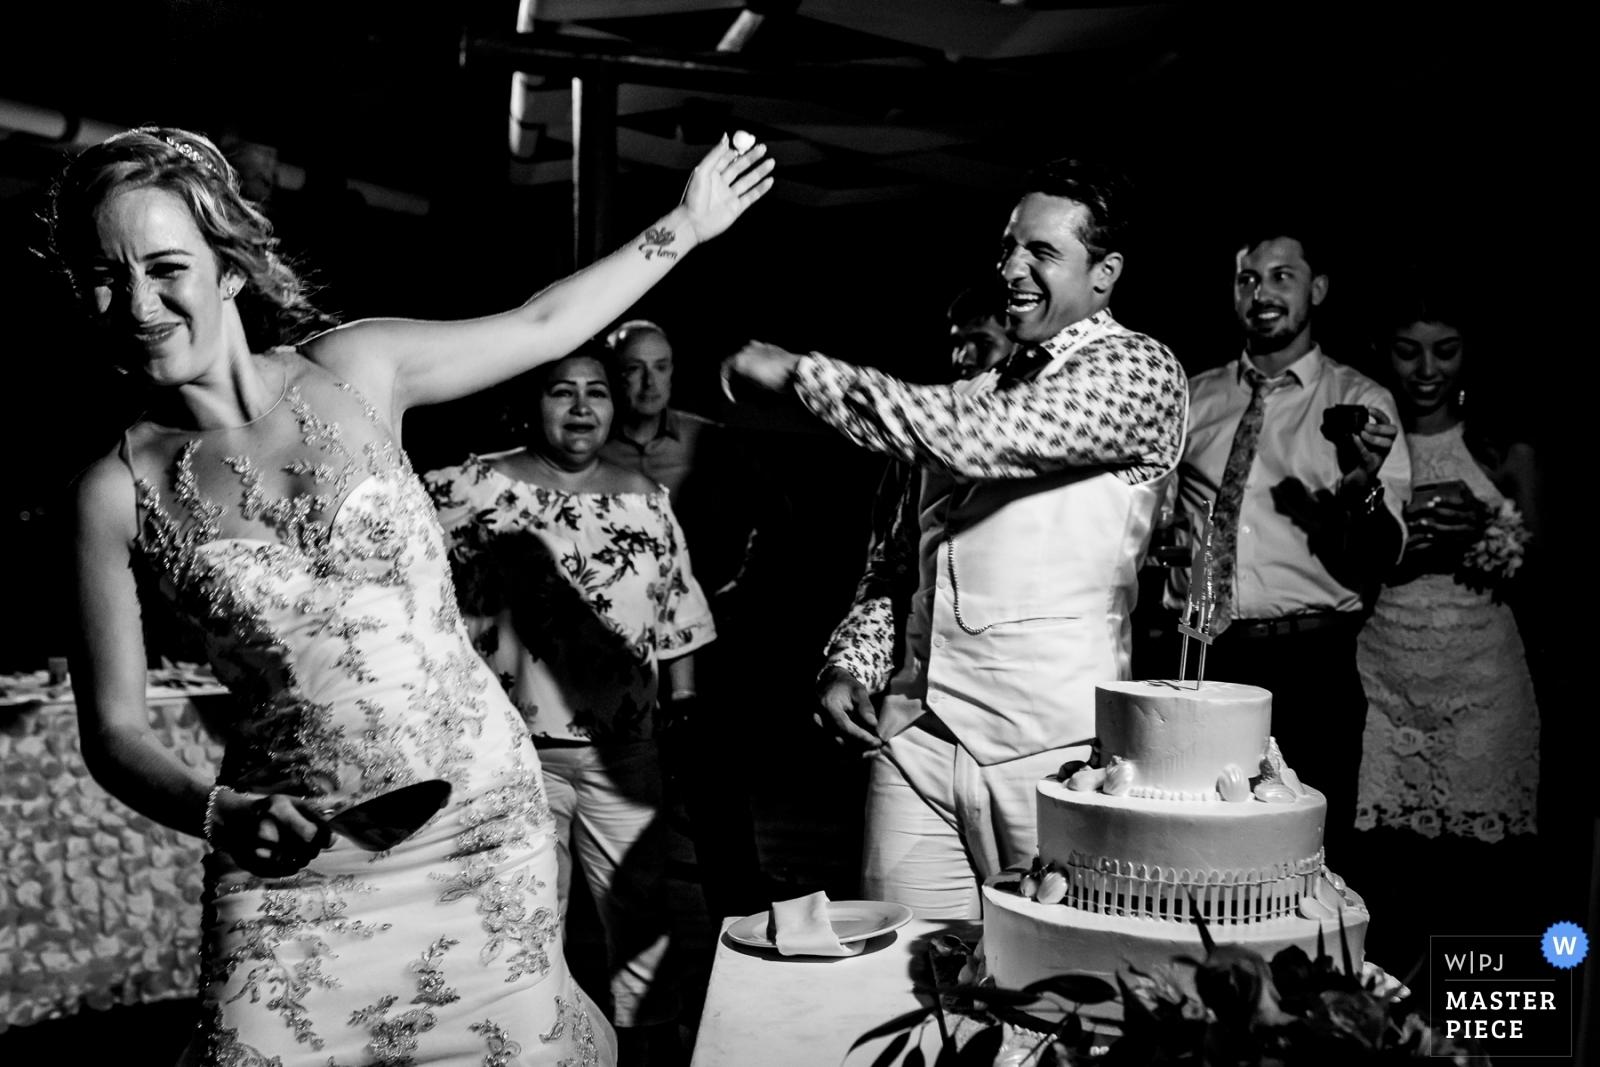 wedding cake bride groom playa del carmen photographer alan fresnel